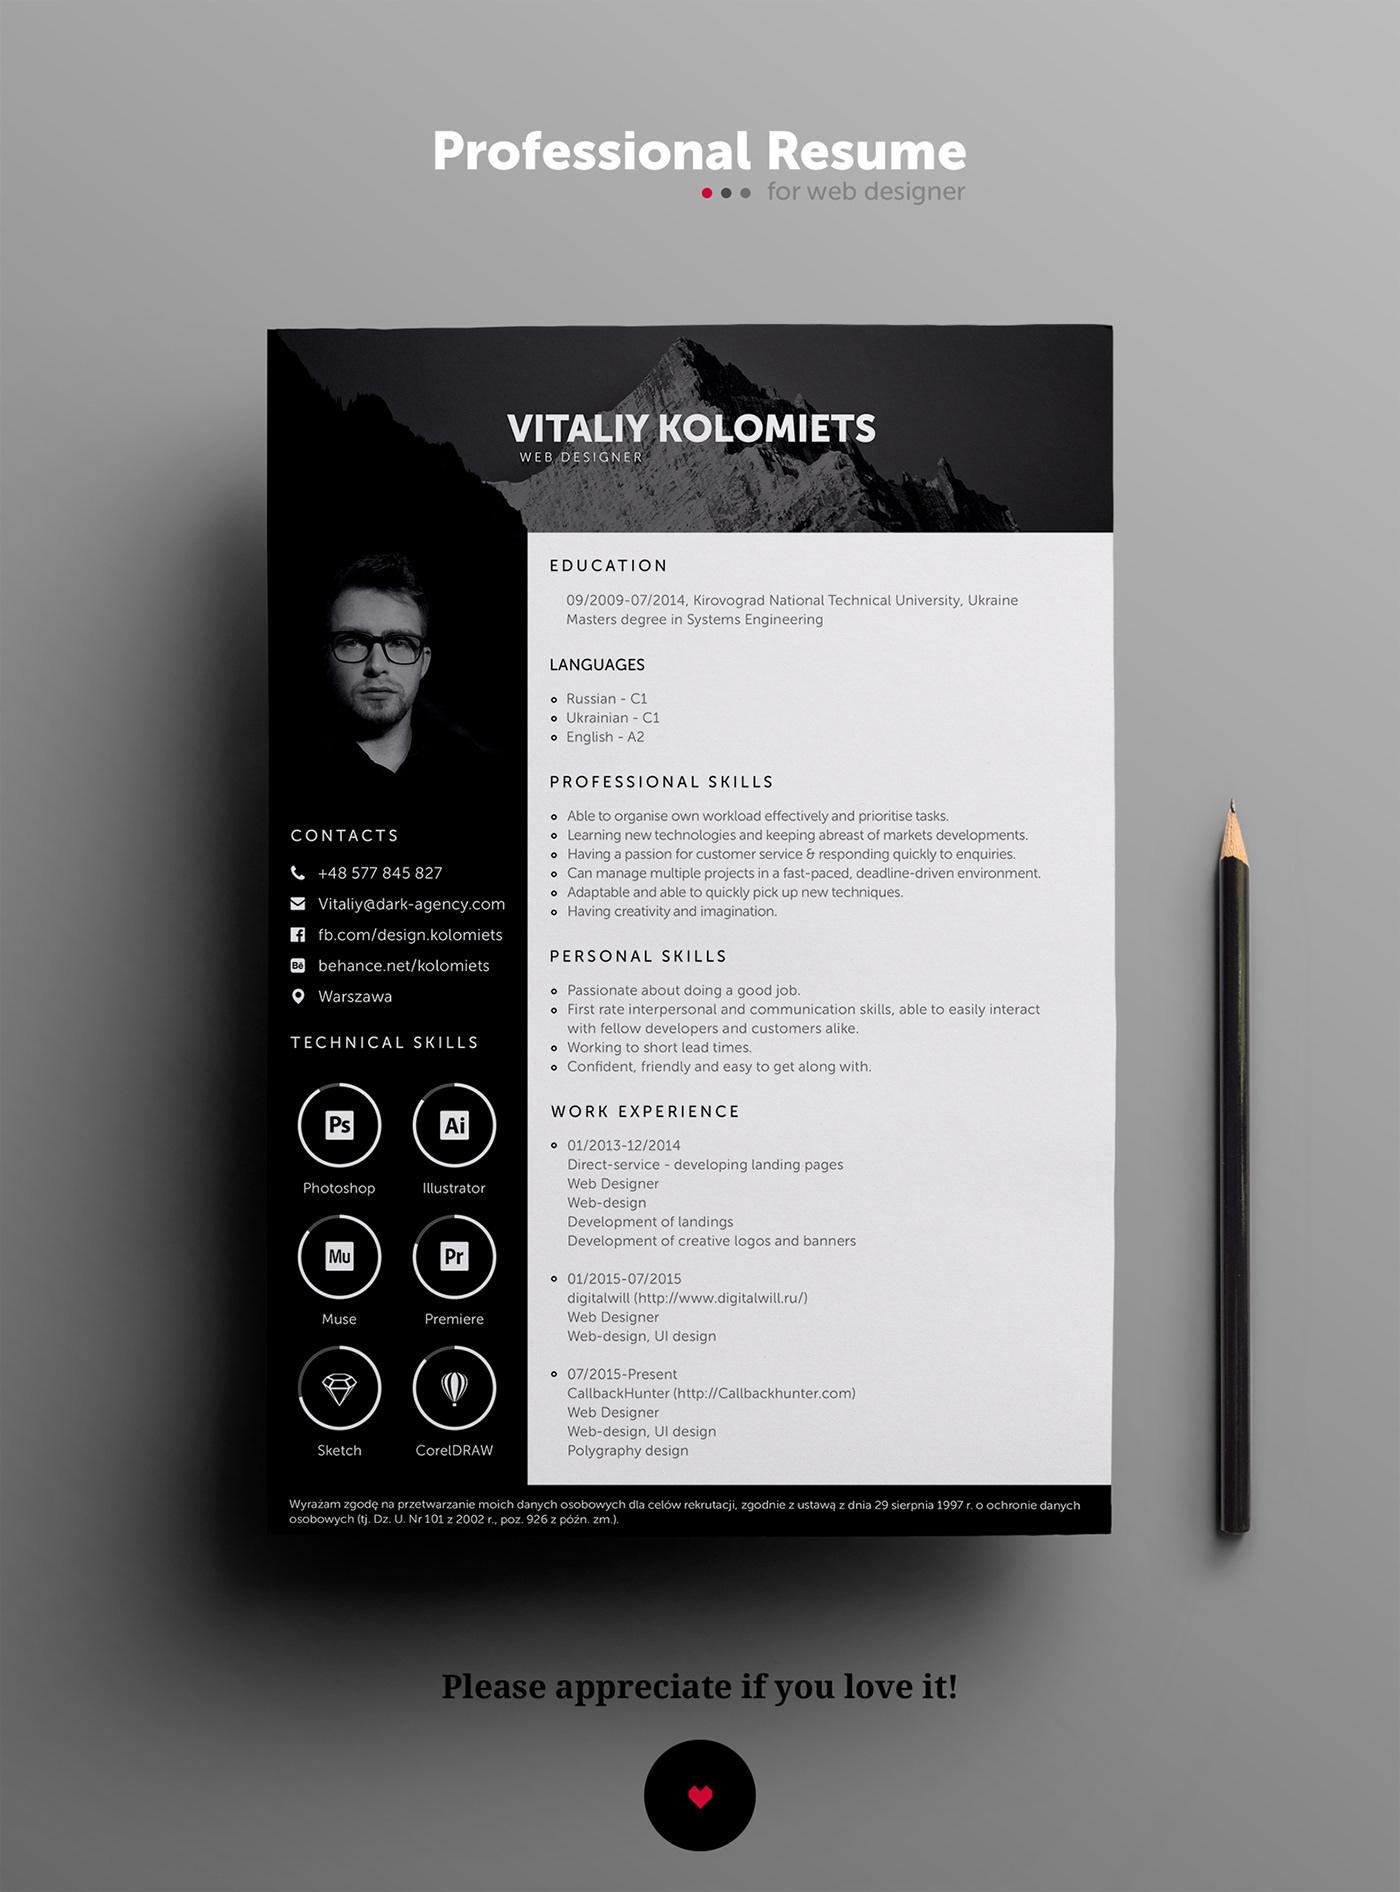 Creative Resume free free cv resume free PSD CV Free Resume template Modern Resume PROFESSIONAL RESUME professional template psd template